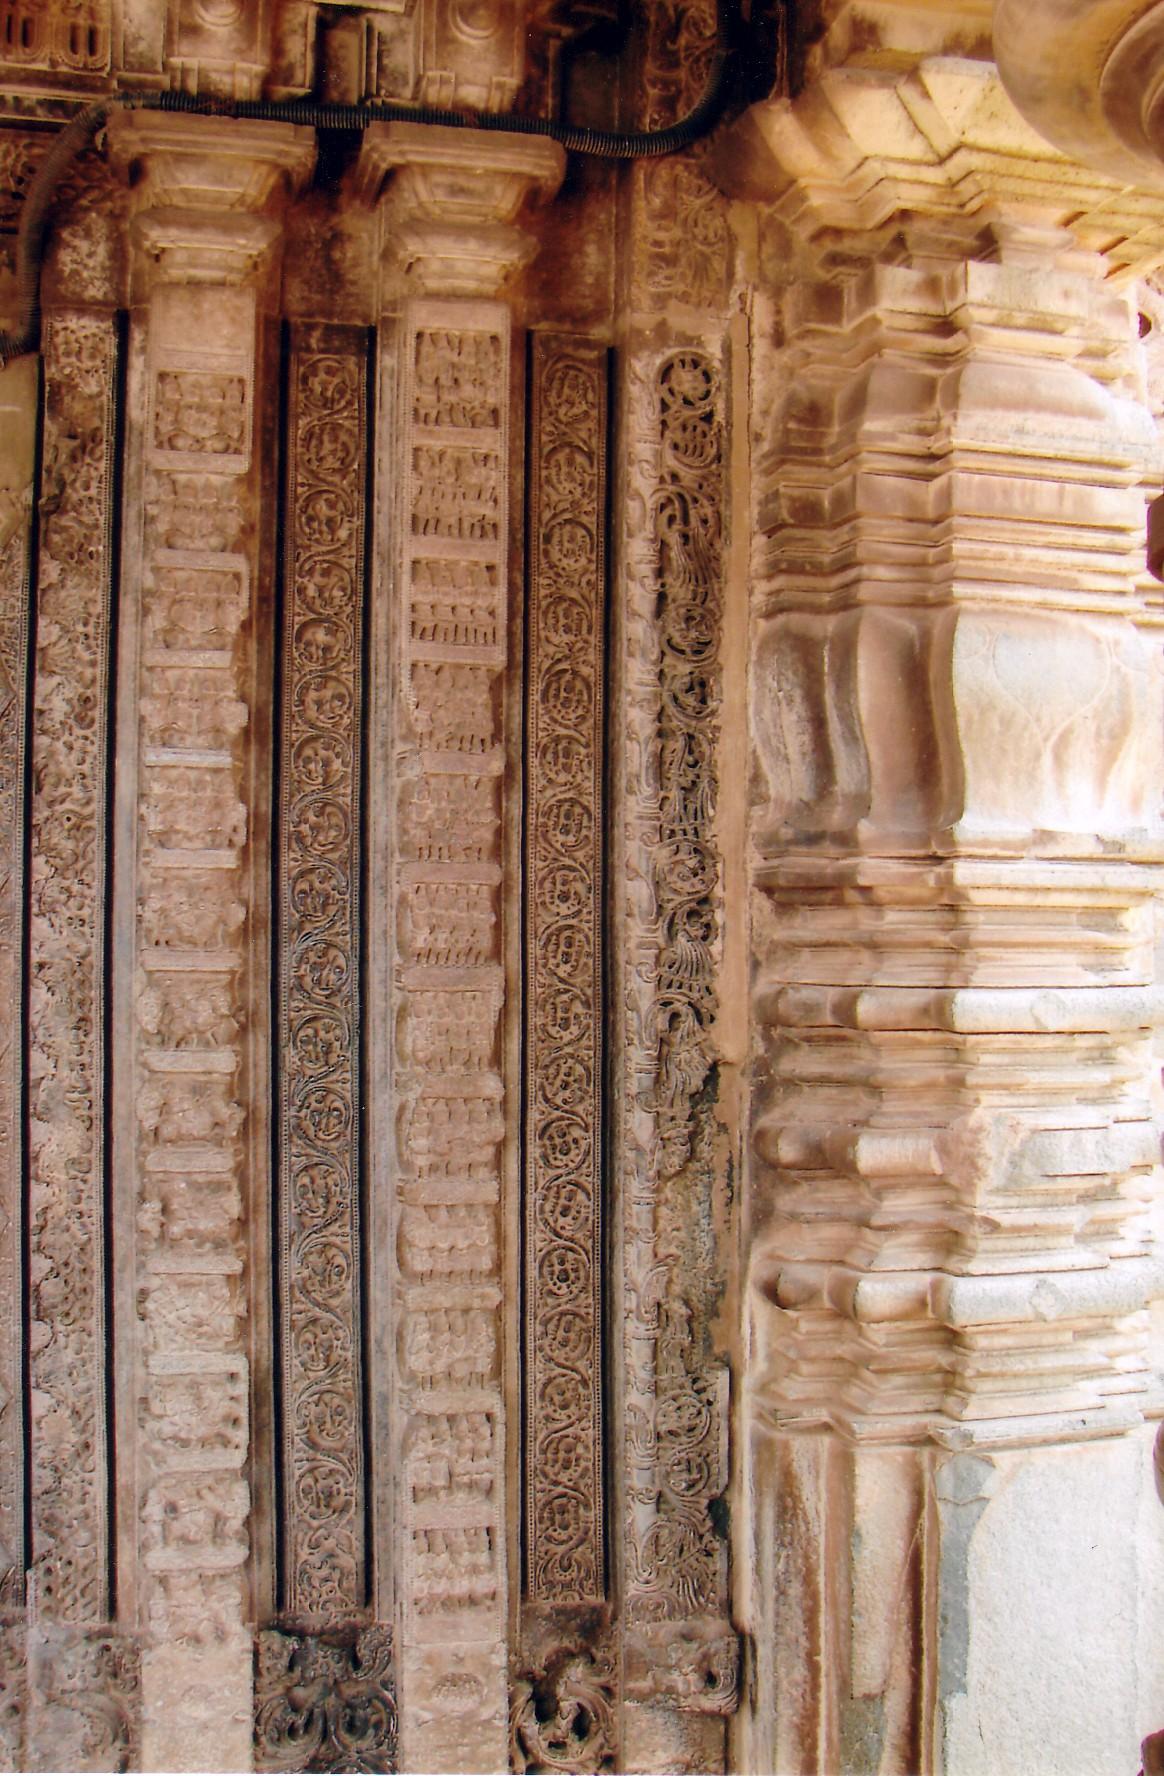 Mahadeva Temple Mahadeva Temple in Itagi